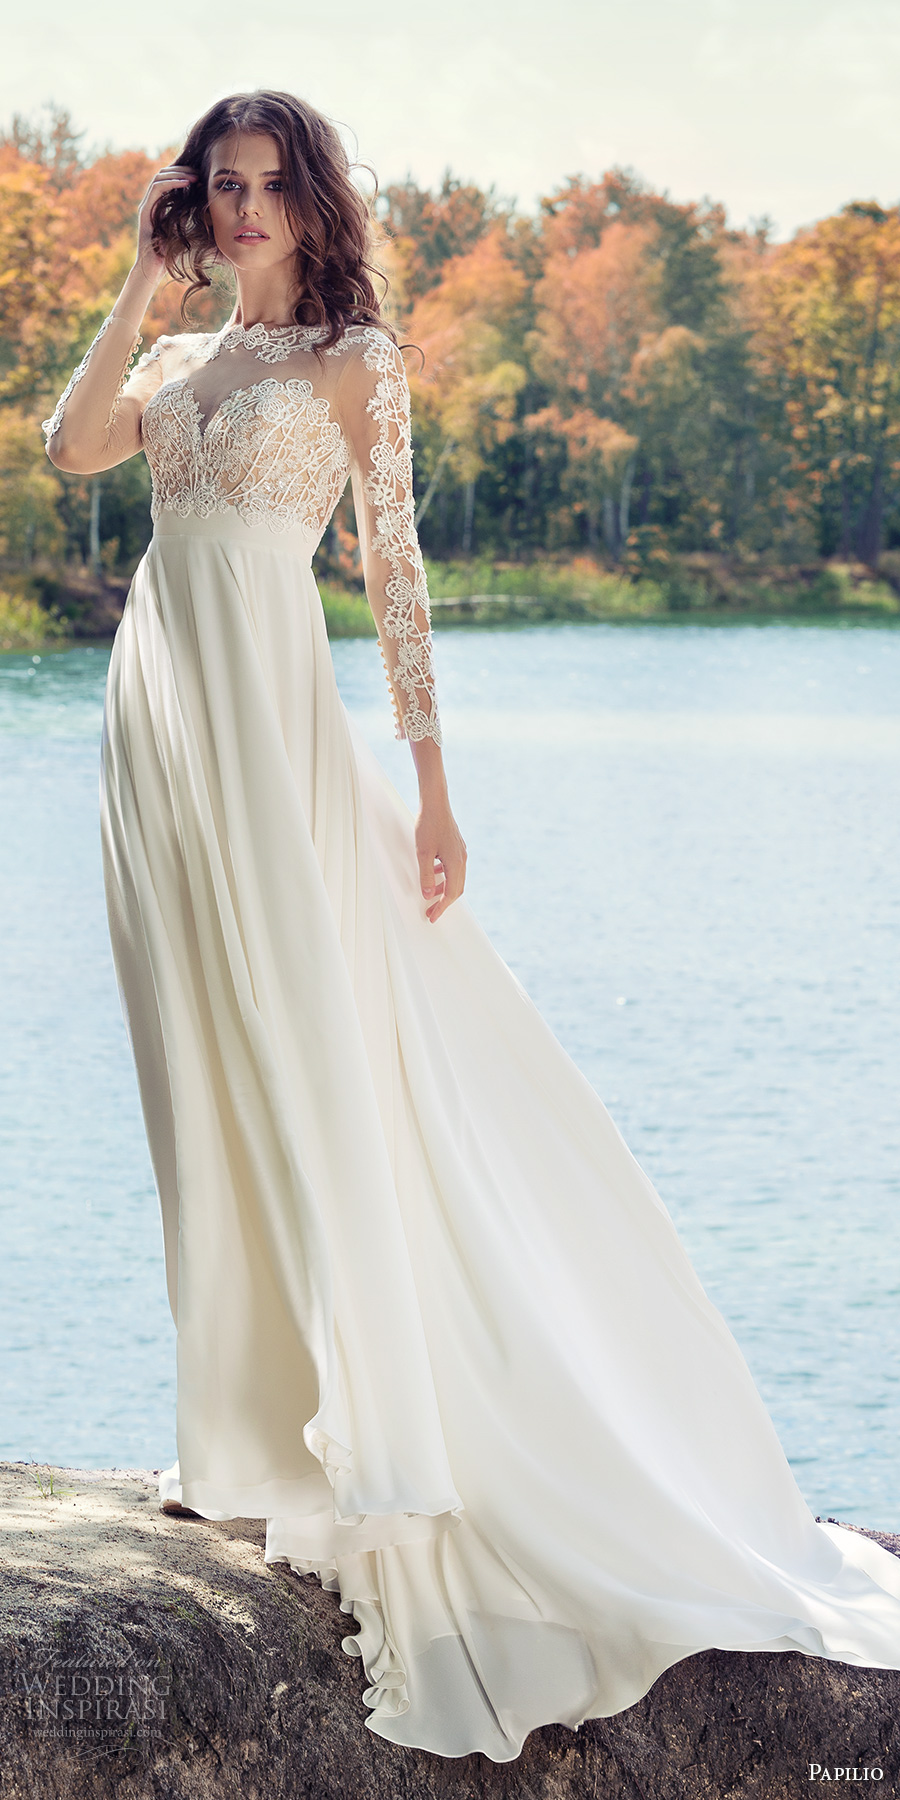 Papilio 2017 Wedding Dresses - crazyforus